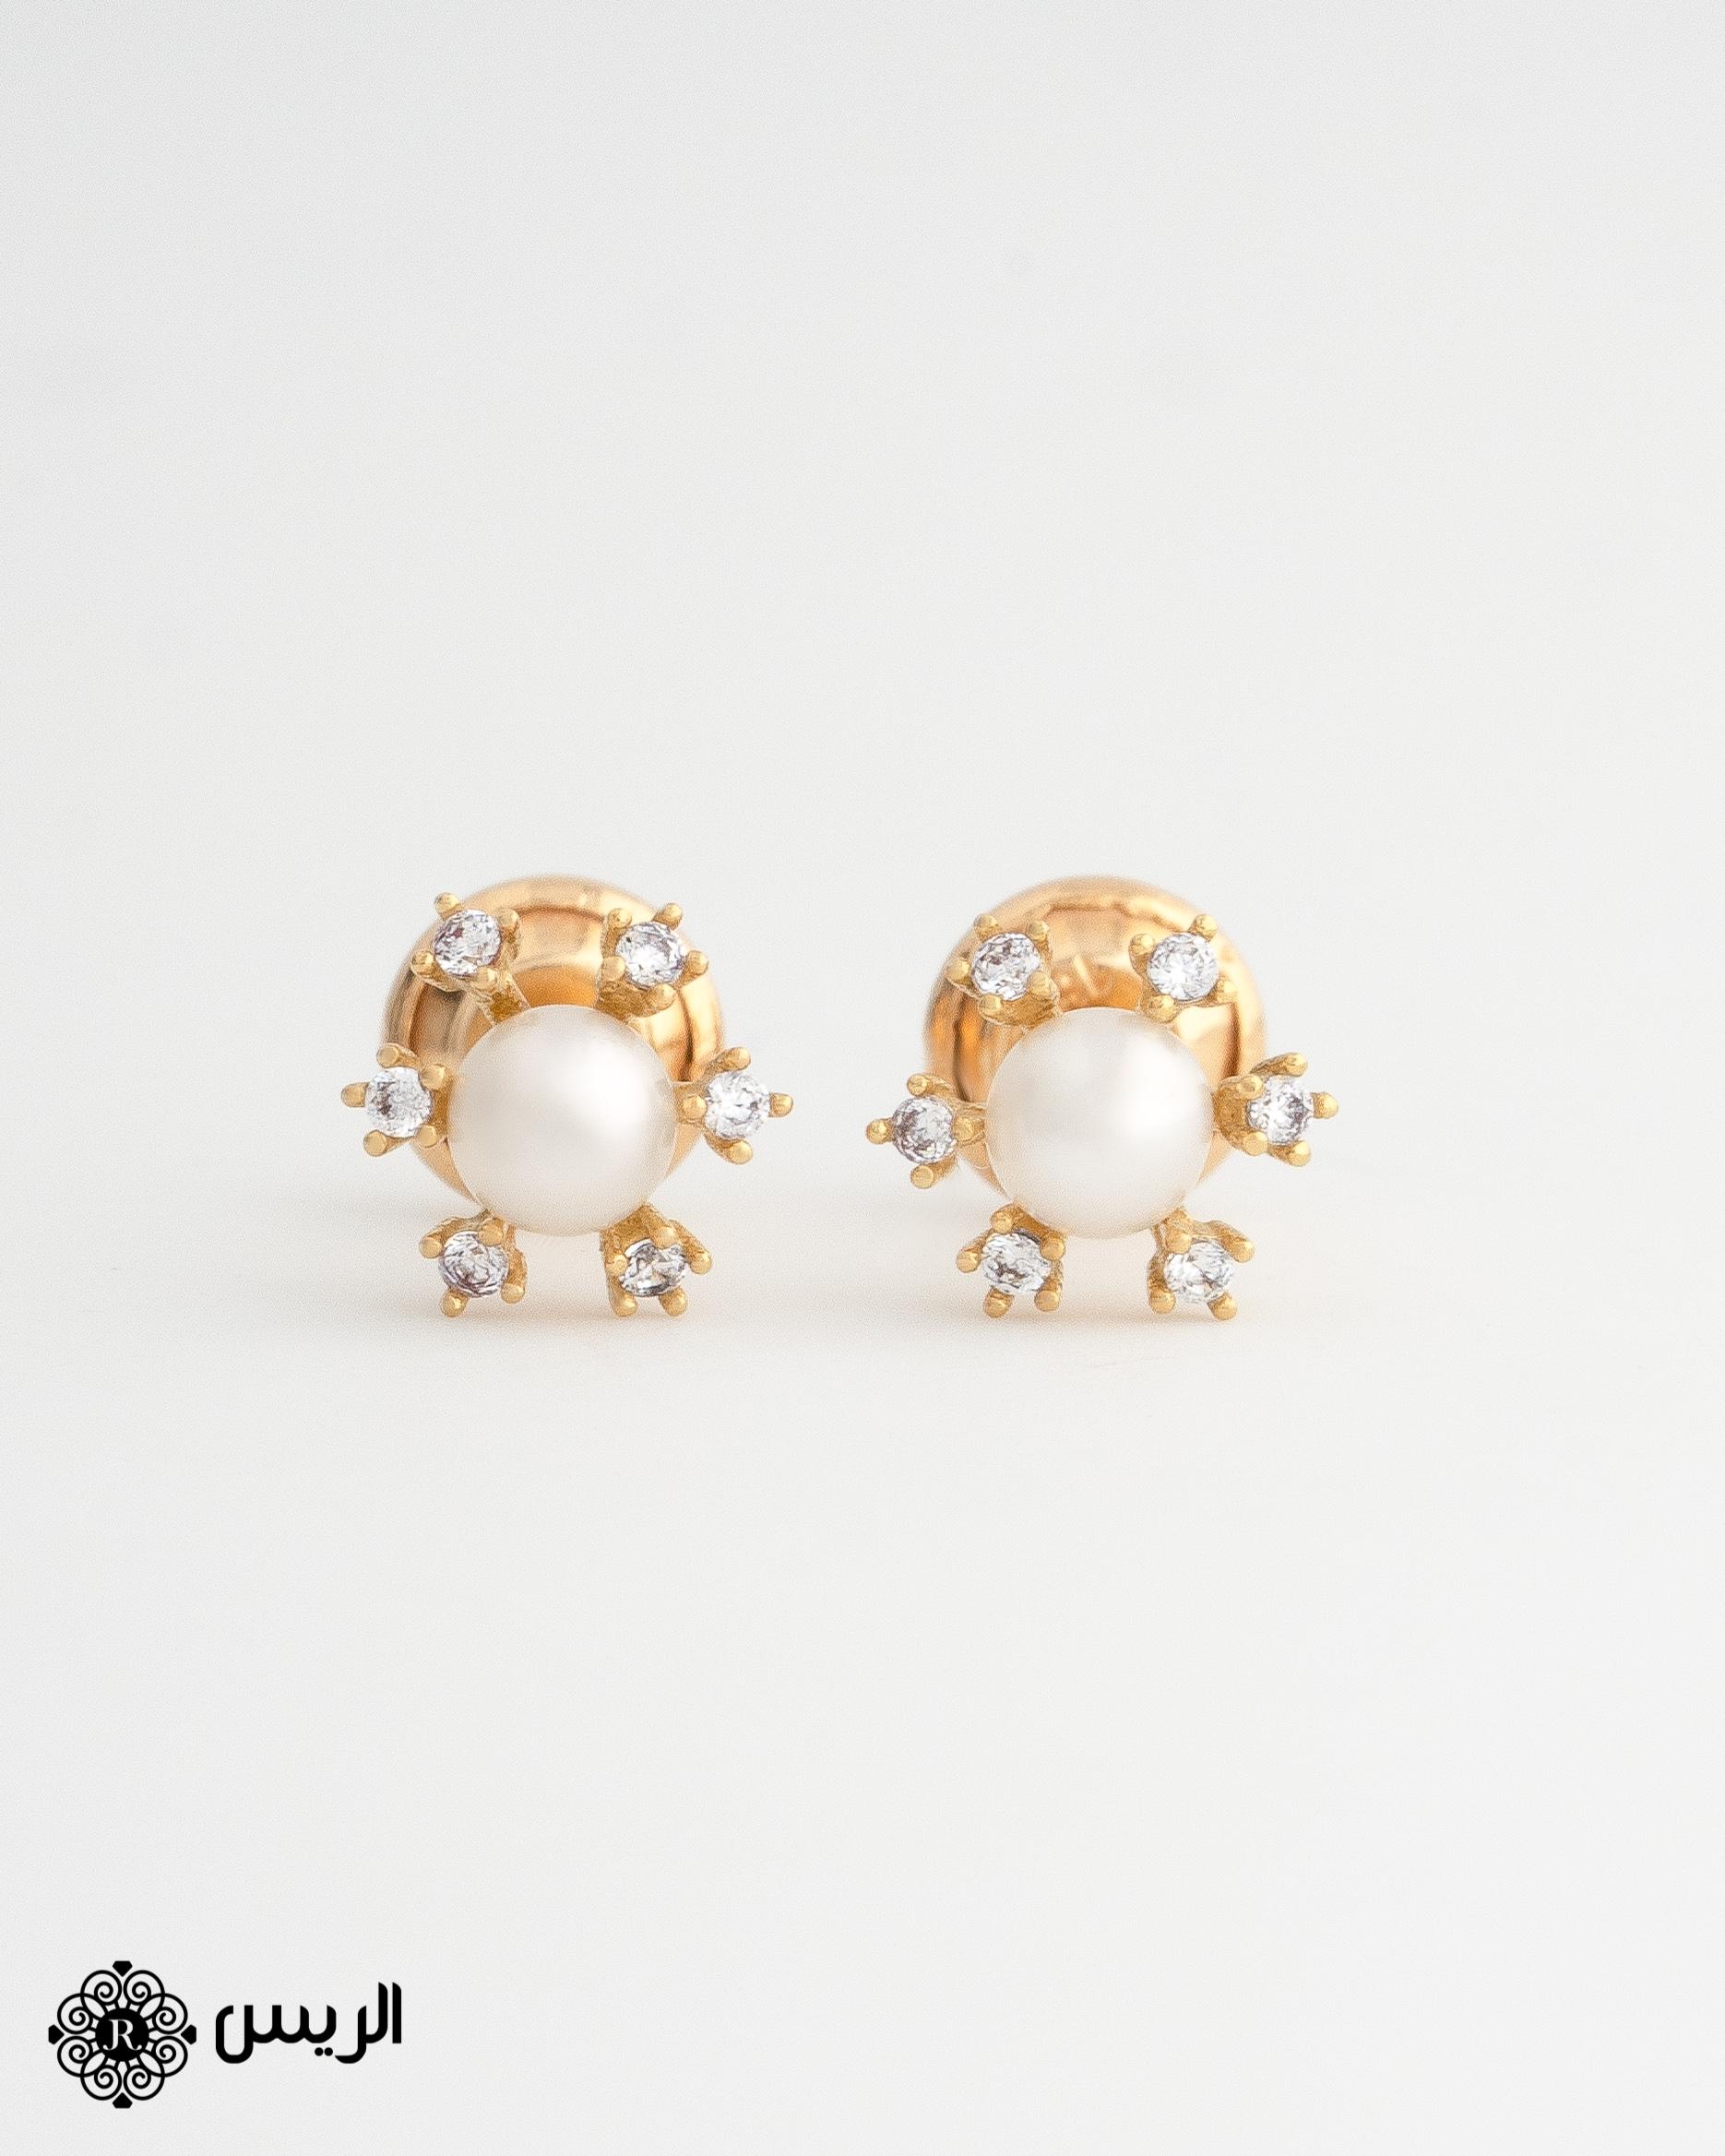 Raies jewelry Kids Earrings حلق أطفال الريس للمجوهرات